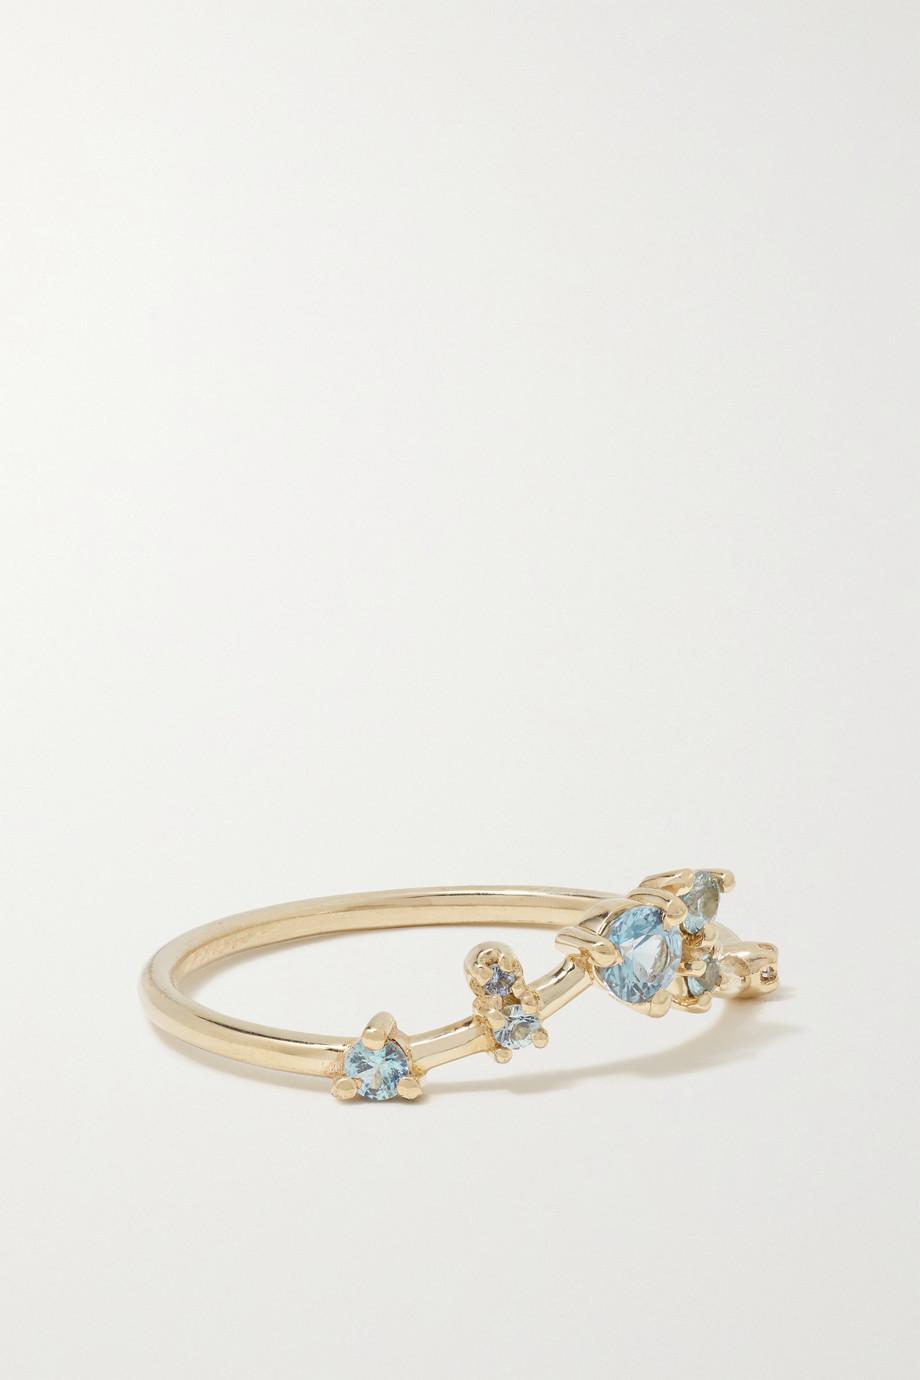 Wwake Bague en or, saphirs et diamant